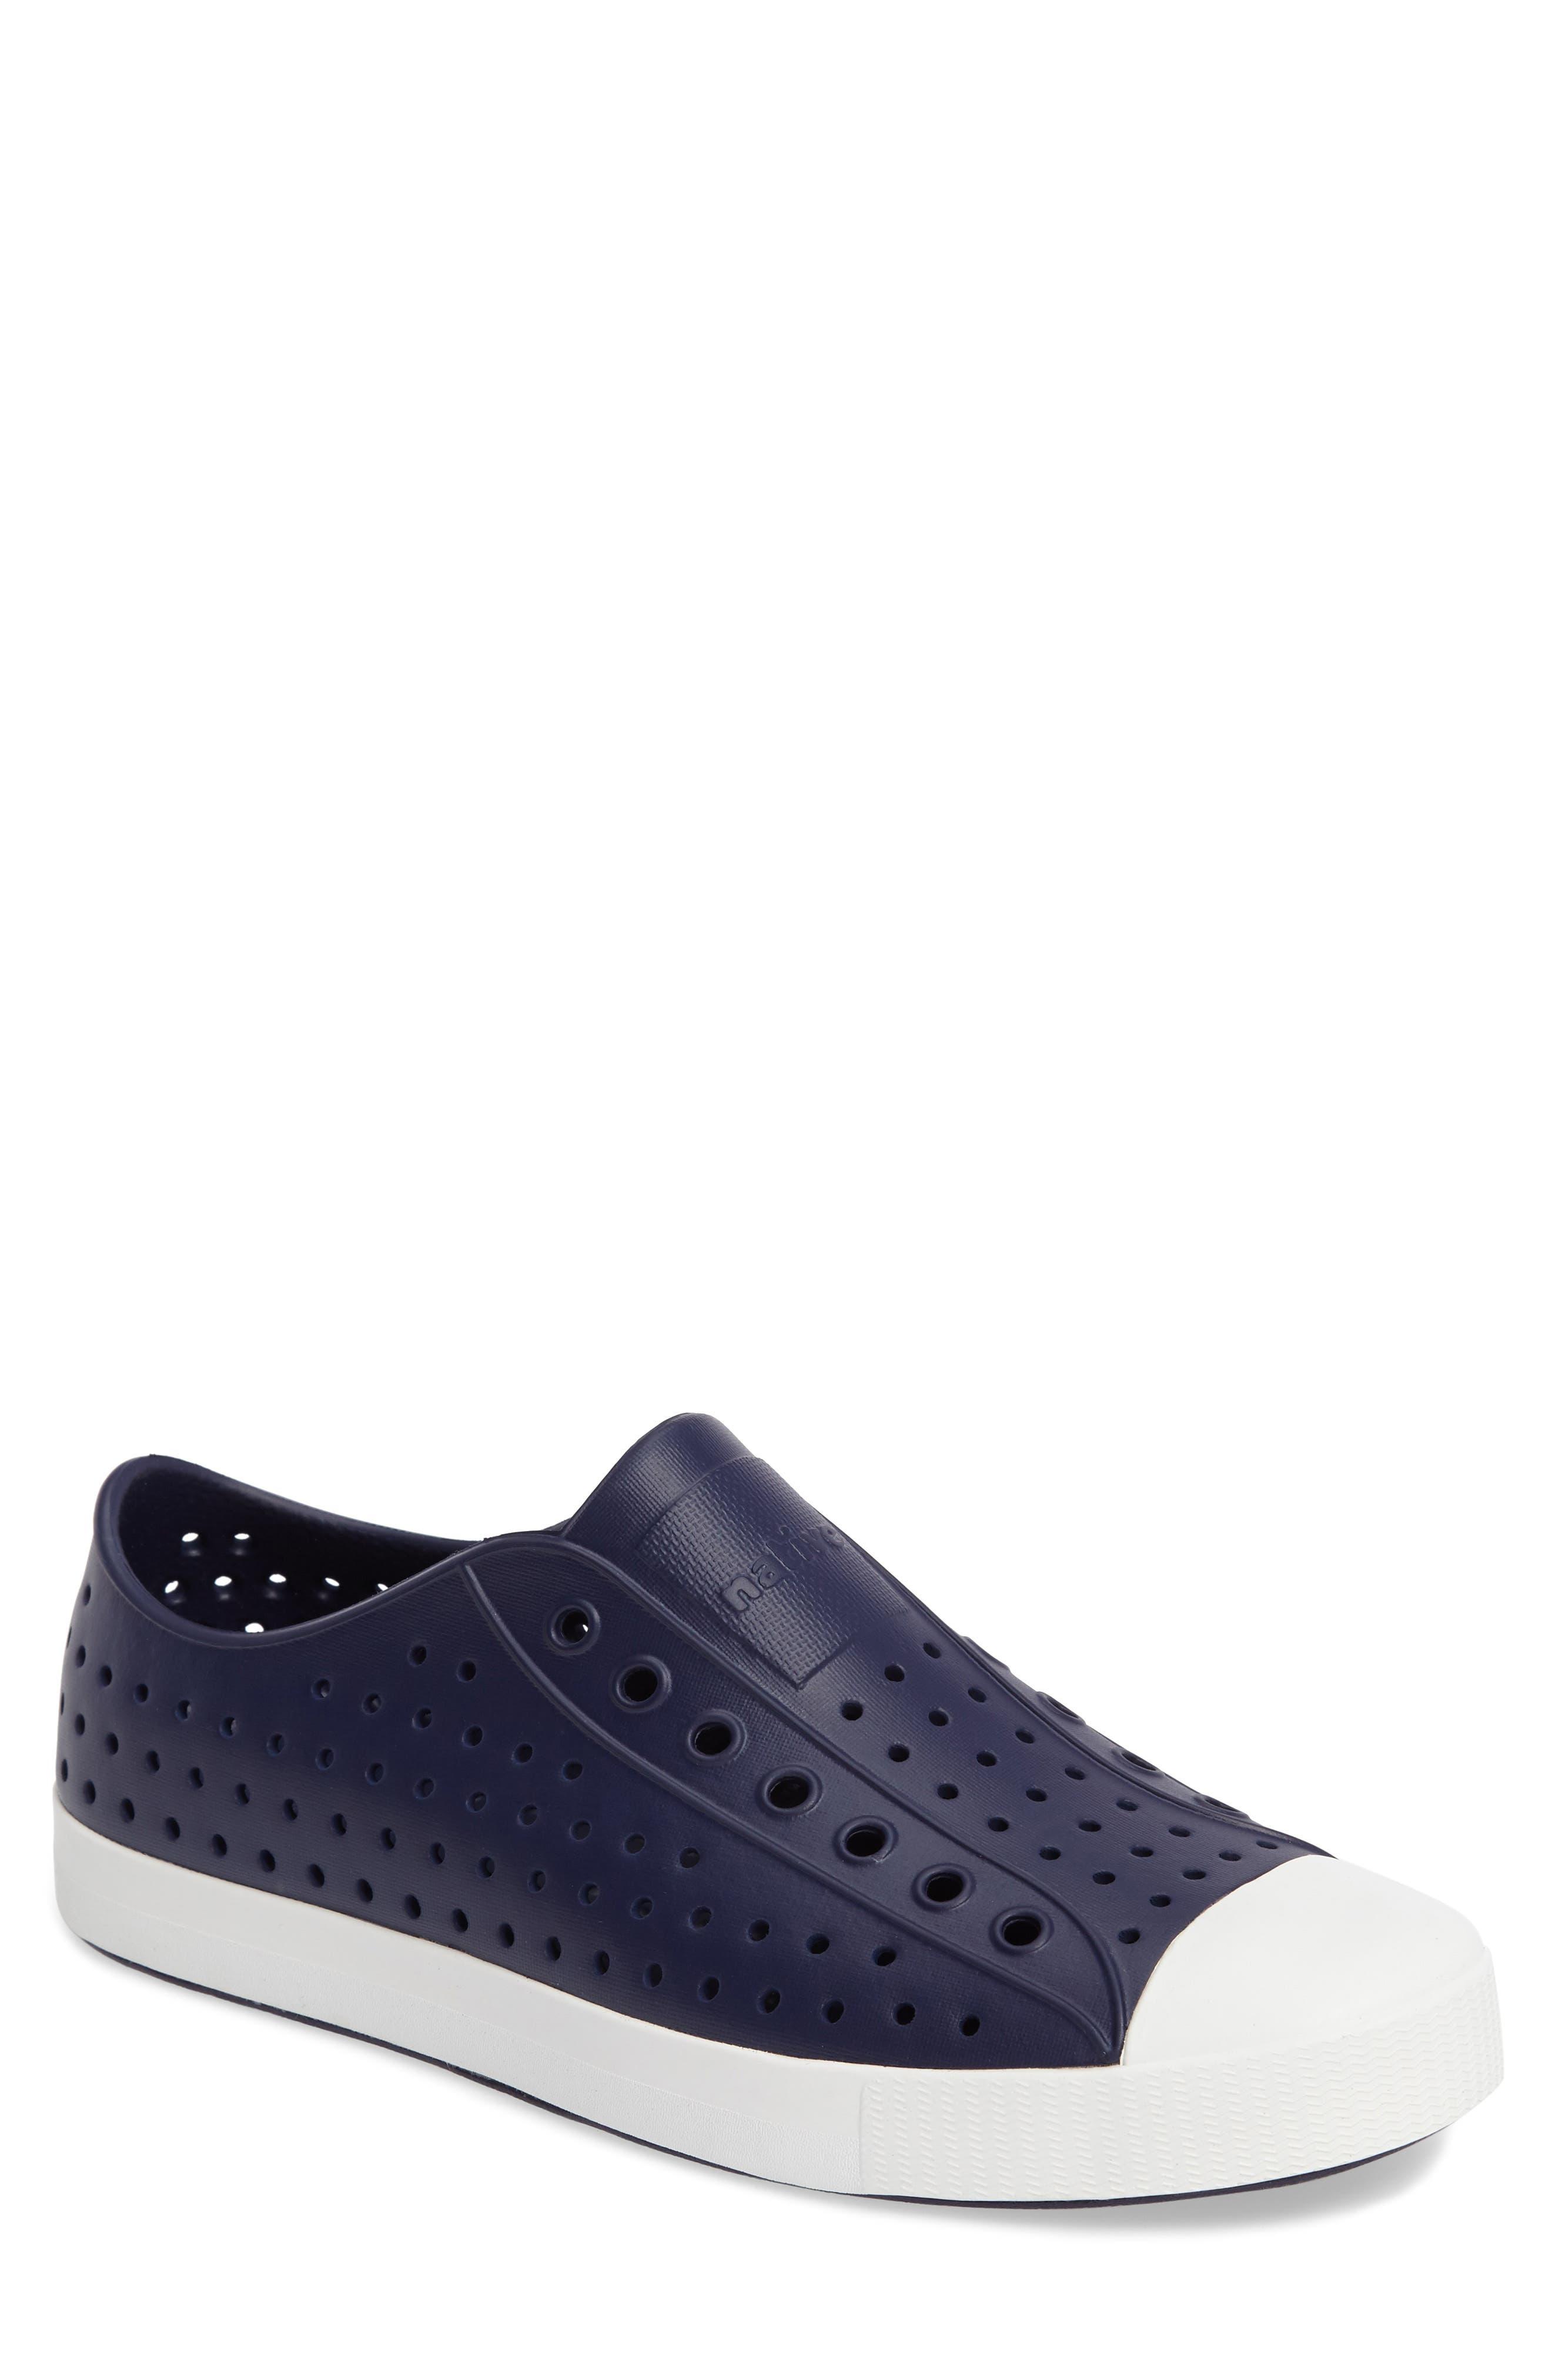 Native Shoes 'Jefferson' Slip-On (Men)